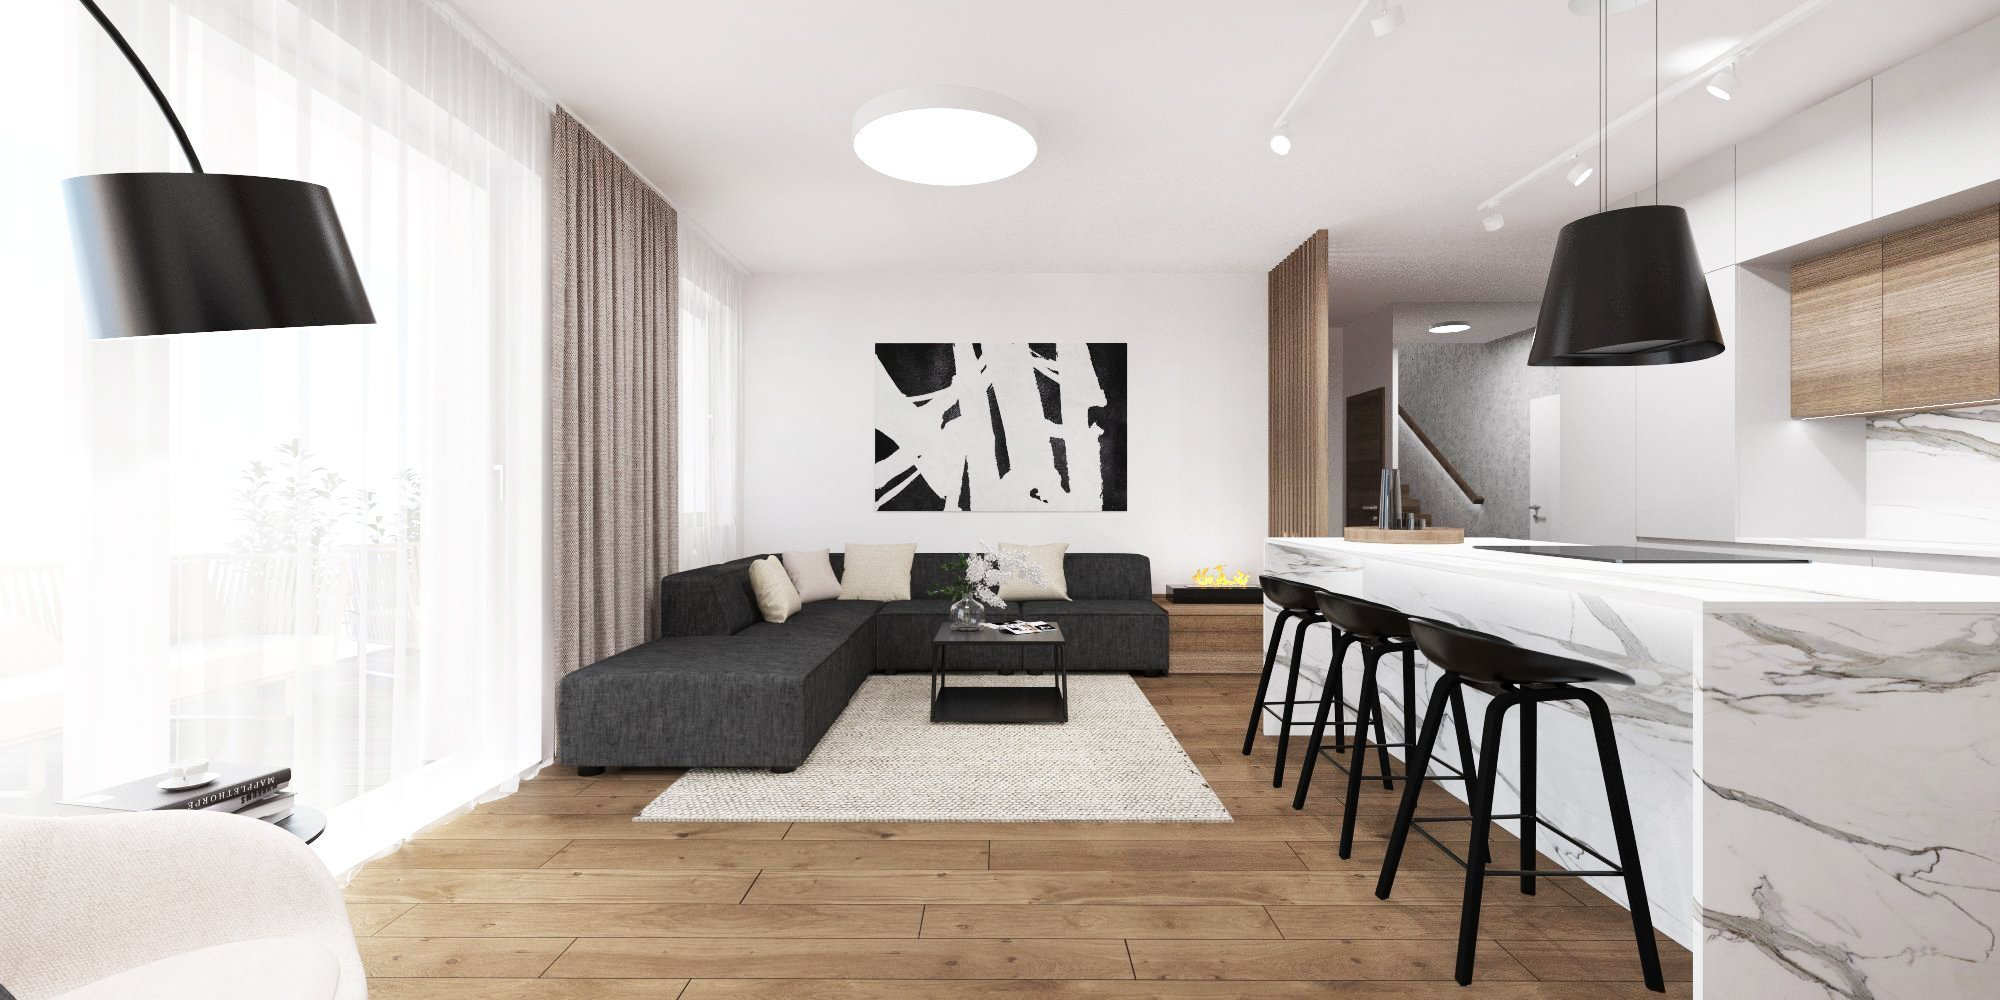 Minimalistický interiér s kontrastom dreva a mramoru.